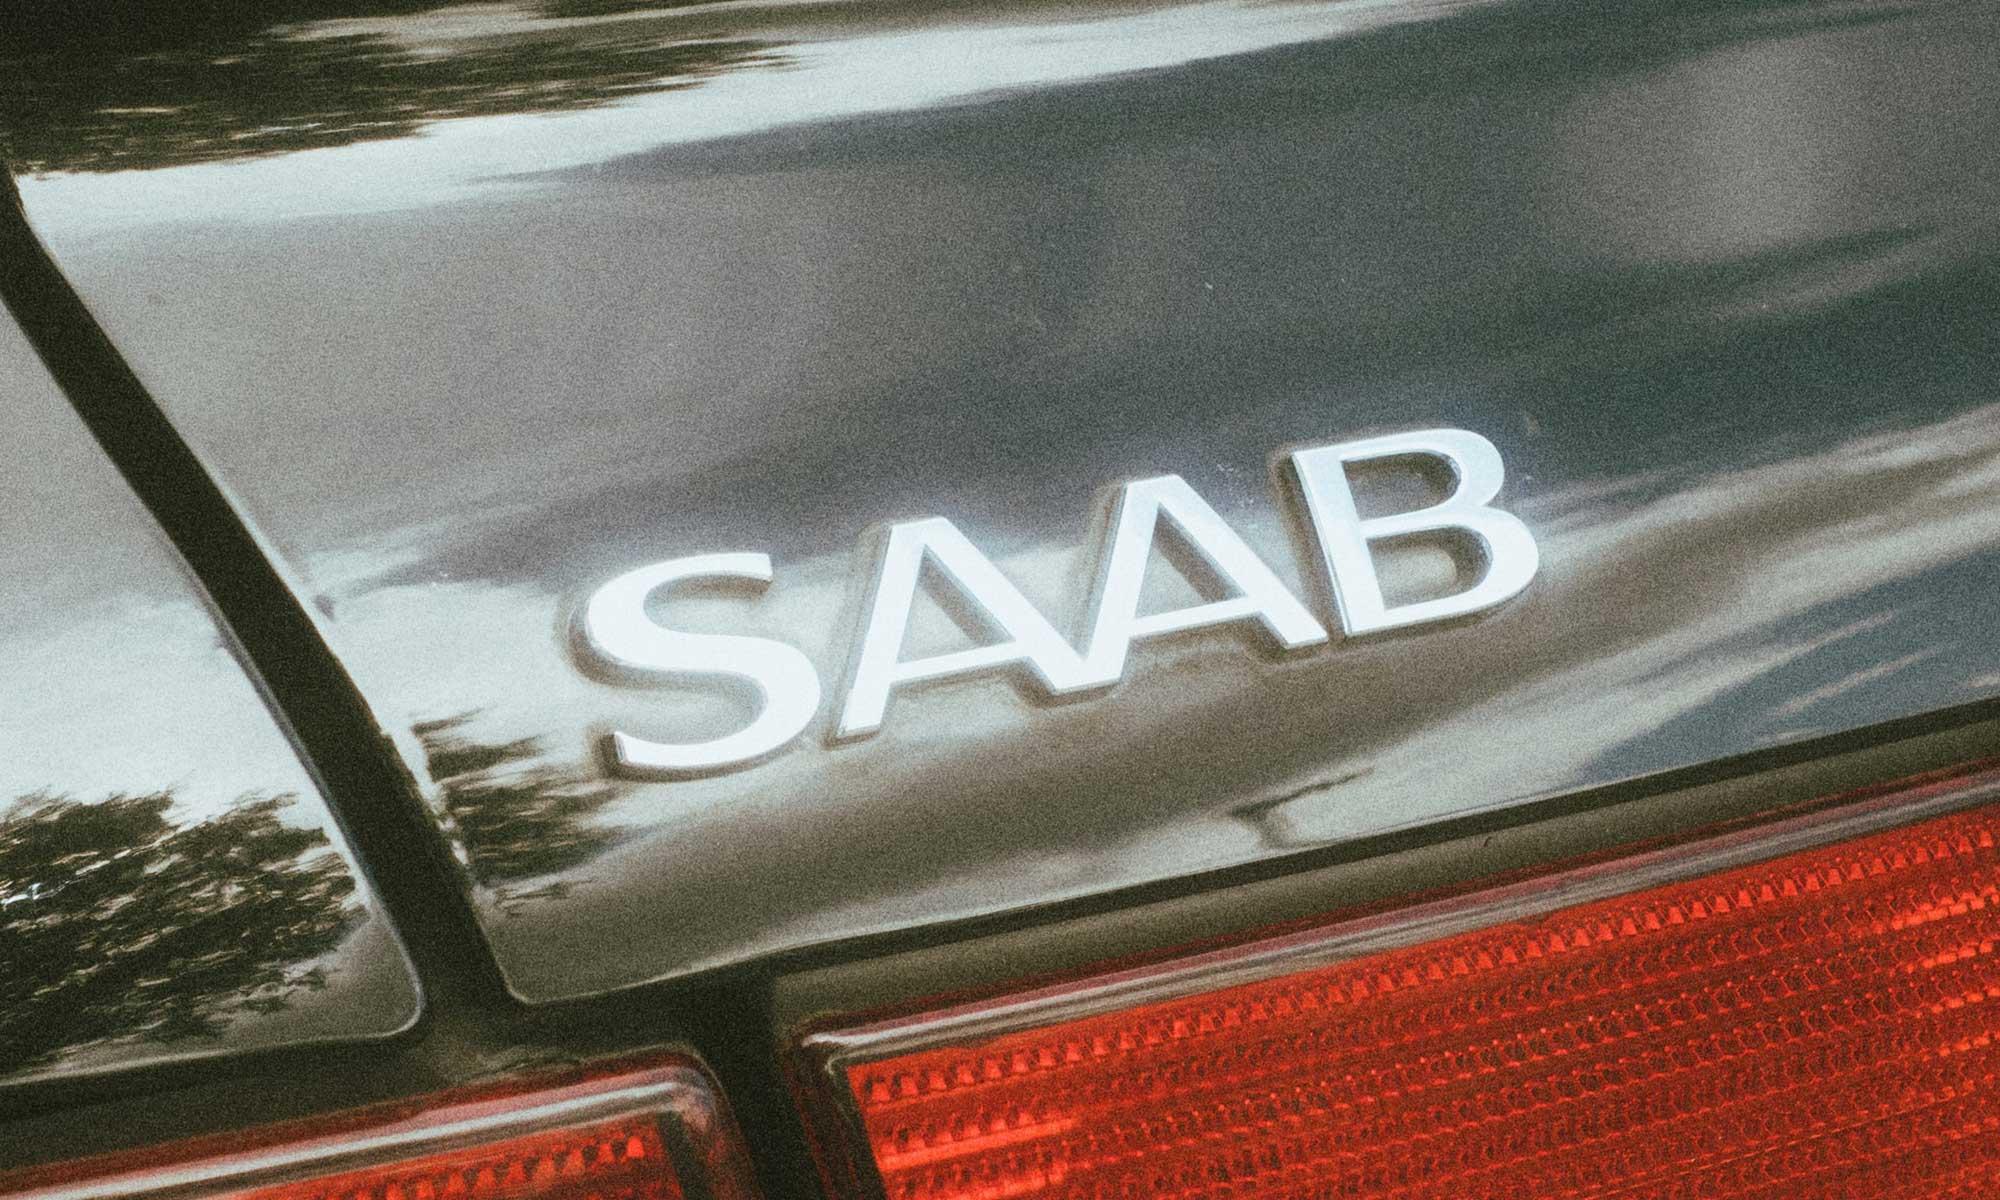 SAAB-extended-warranty